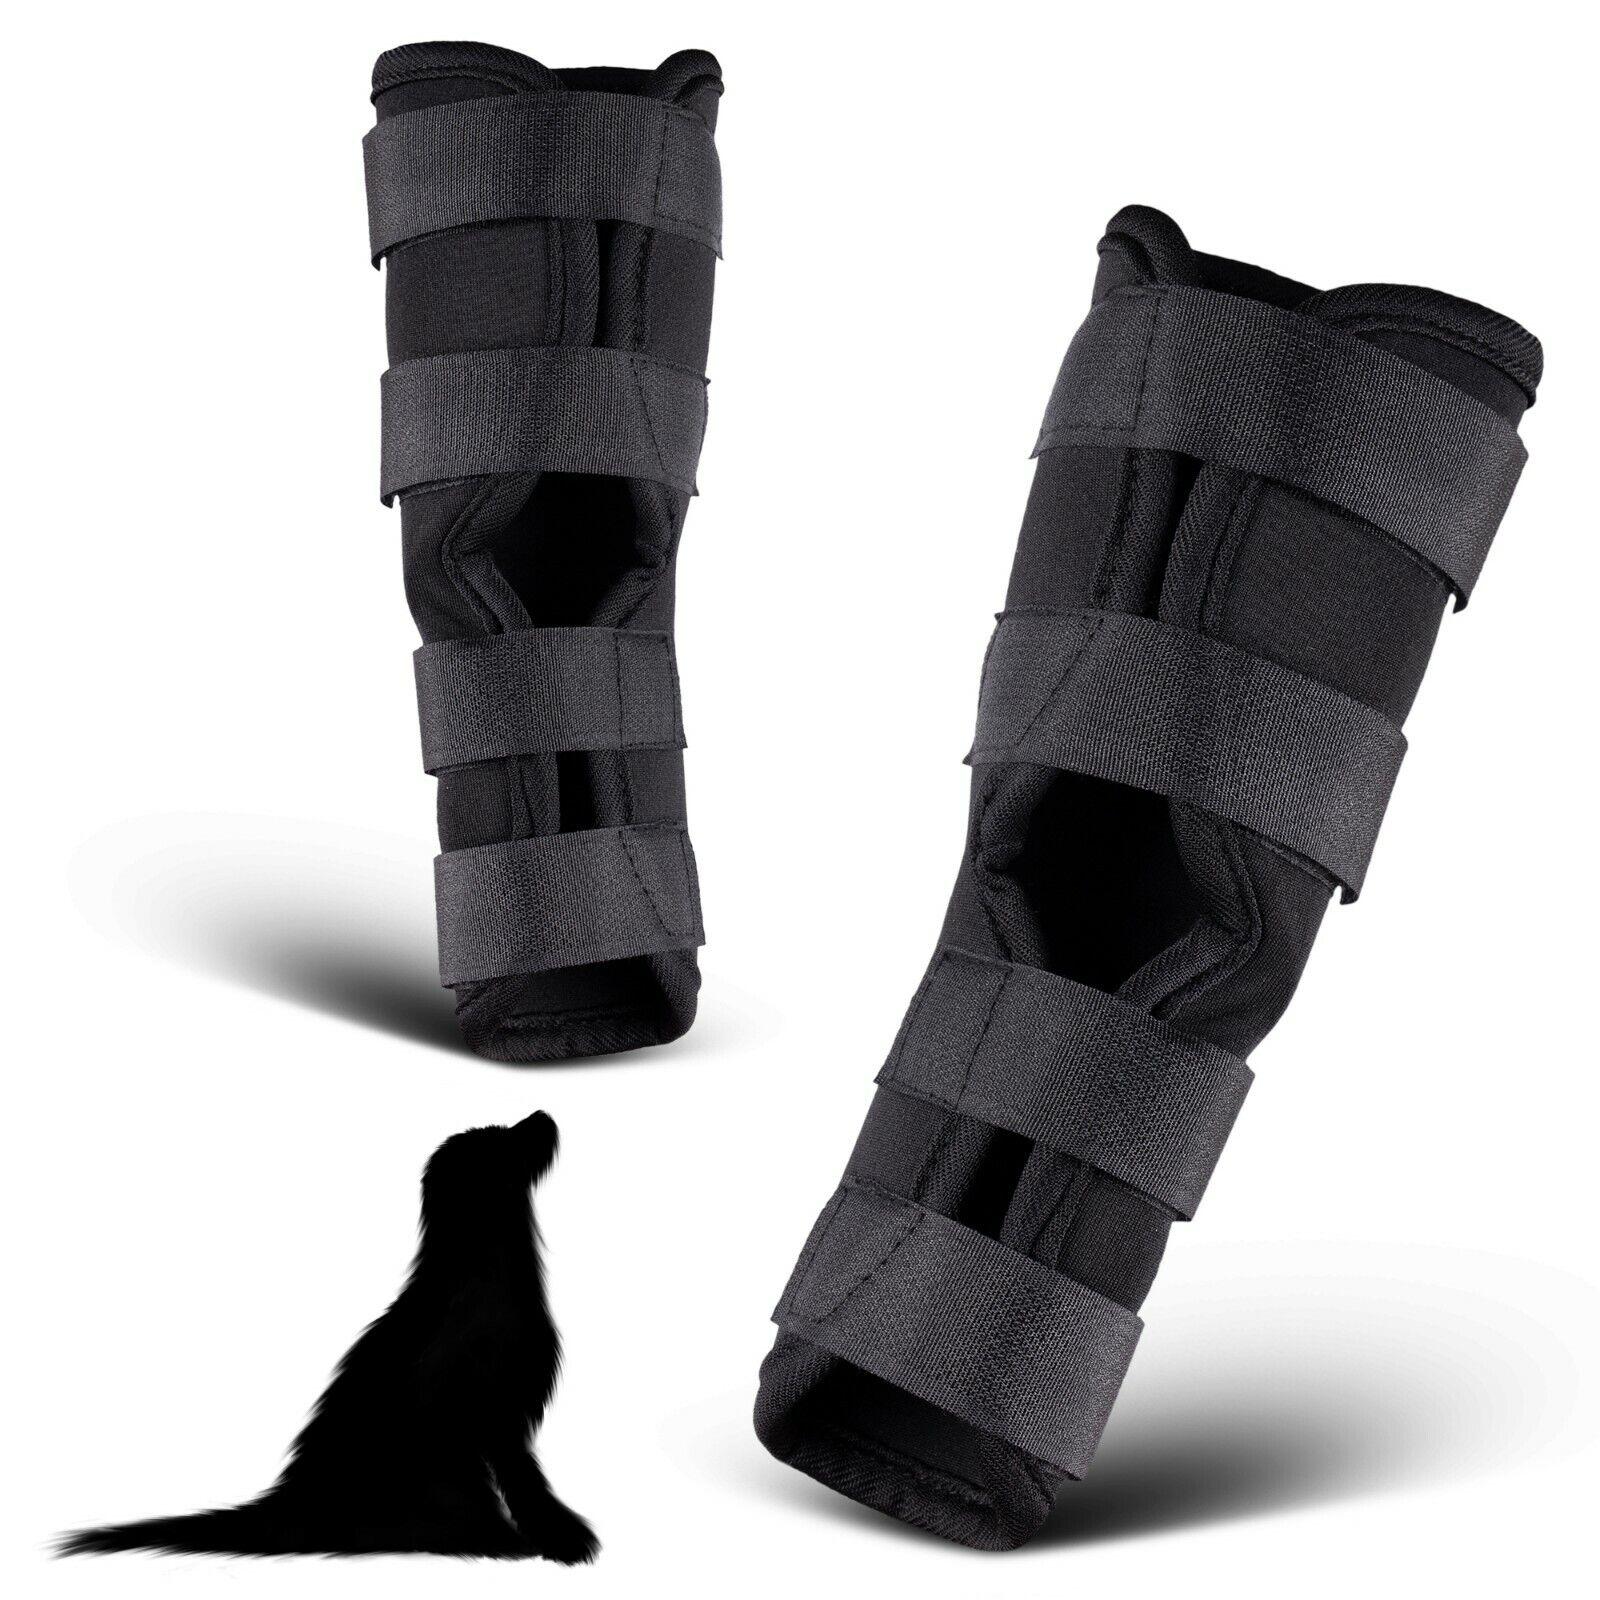 PamperPets® Hunde-Bandage | Gelenkbandage | Leckschutz | Vorder- & Hinterbein